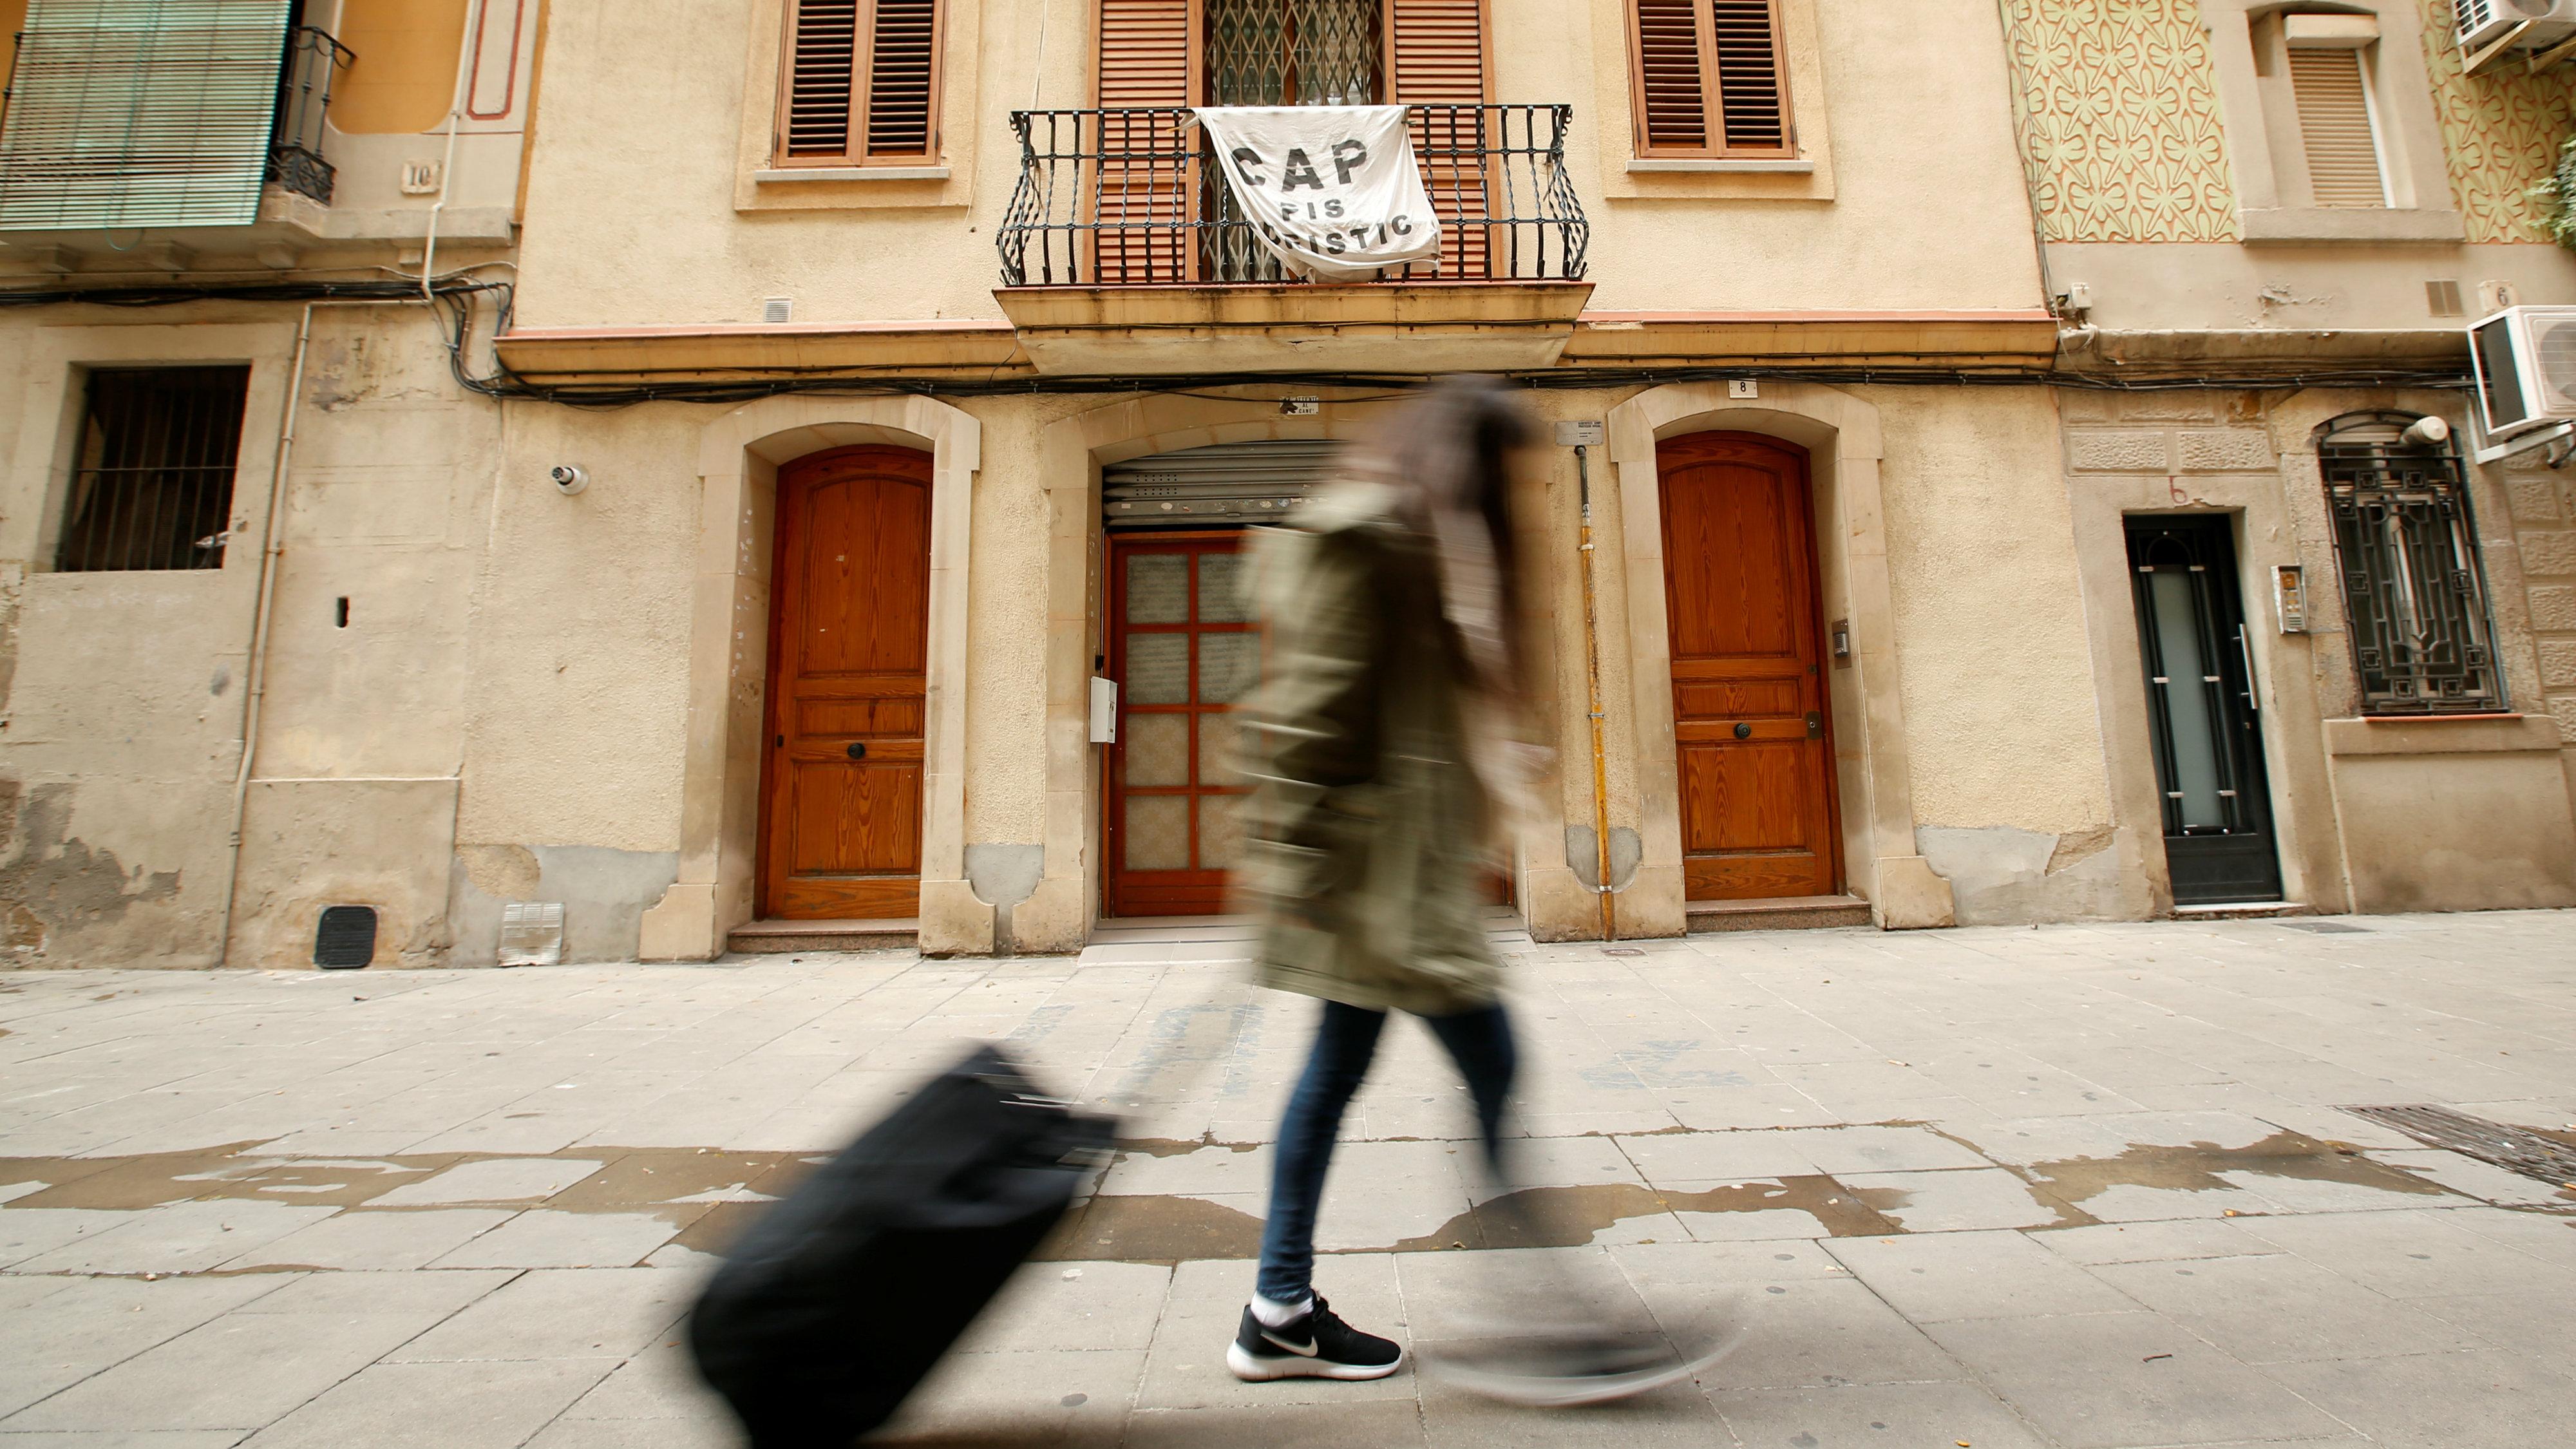 Barcelona hates tourists